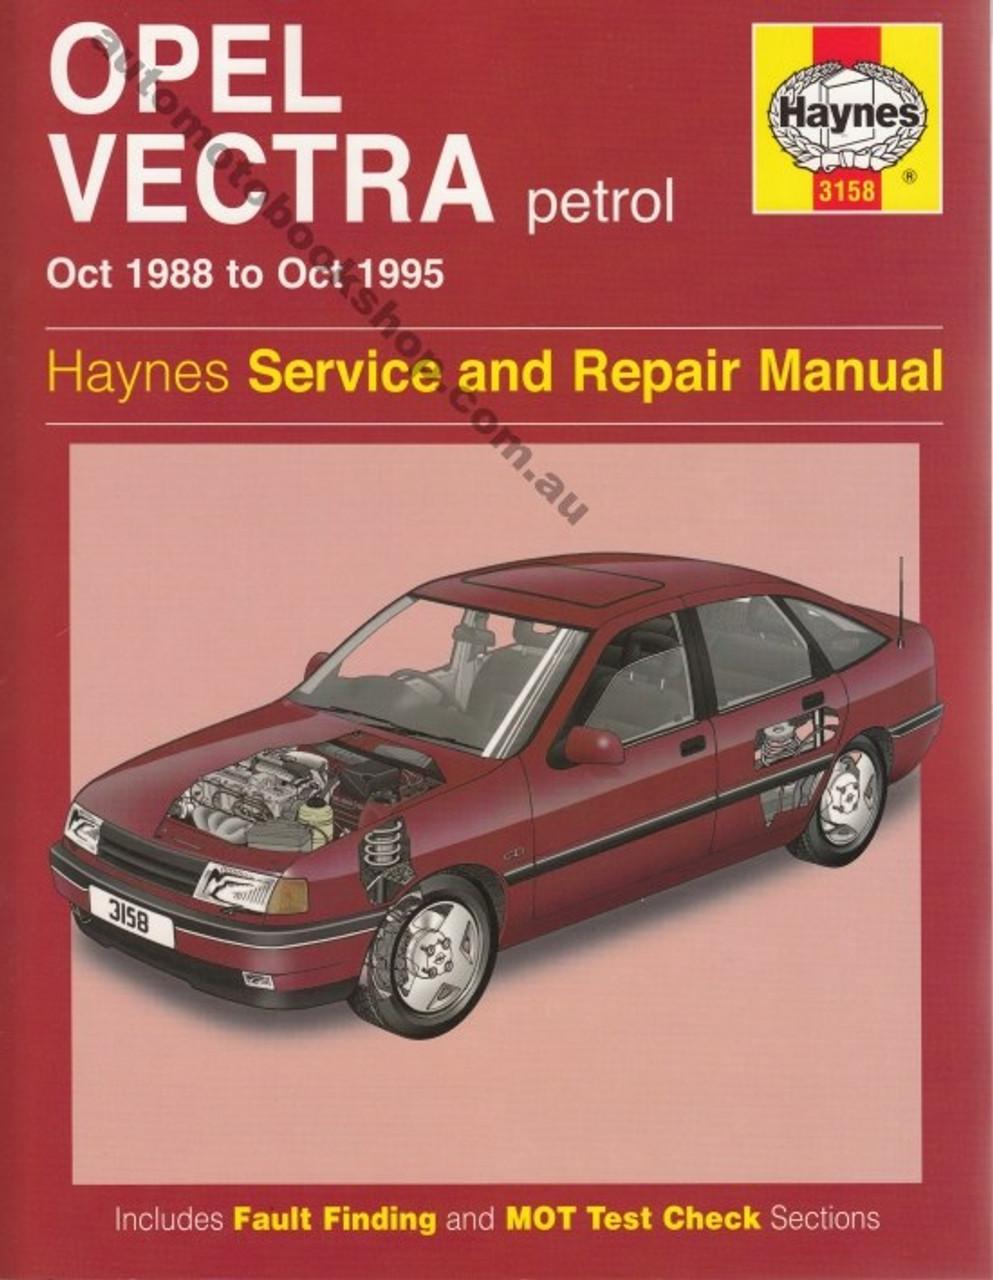 opel vectra maintenance manual product user guide instruction u2022 rh testdpc co opel vectra b 2000 user manual opel vectra b 2000 user manual